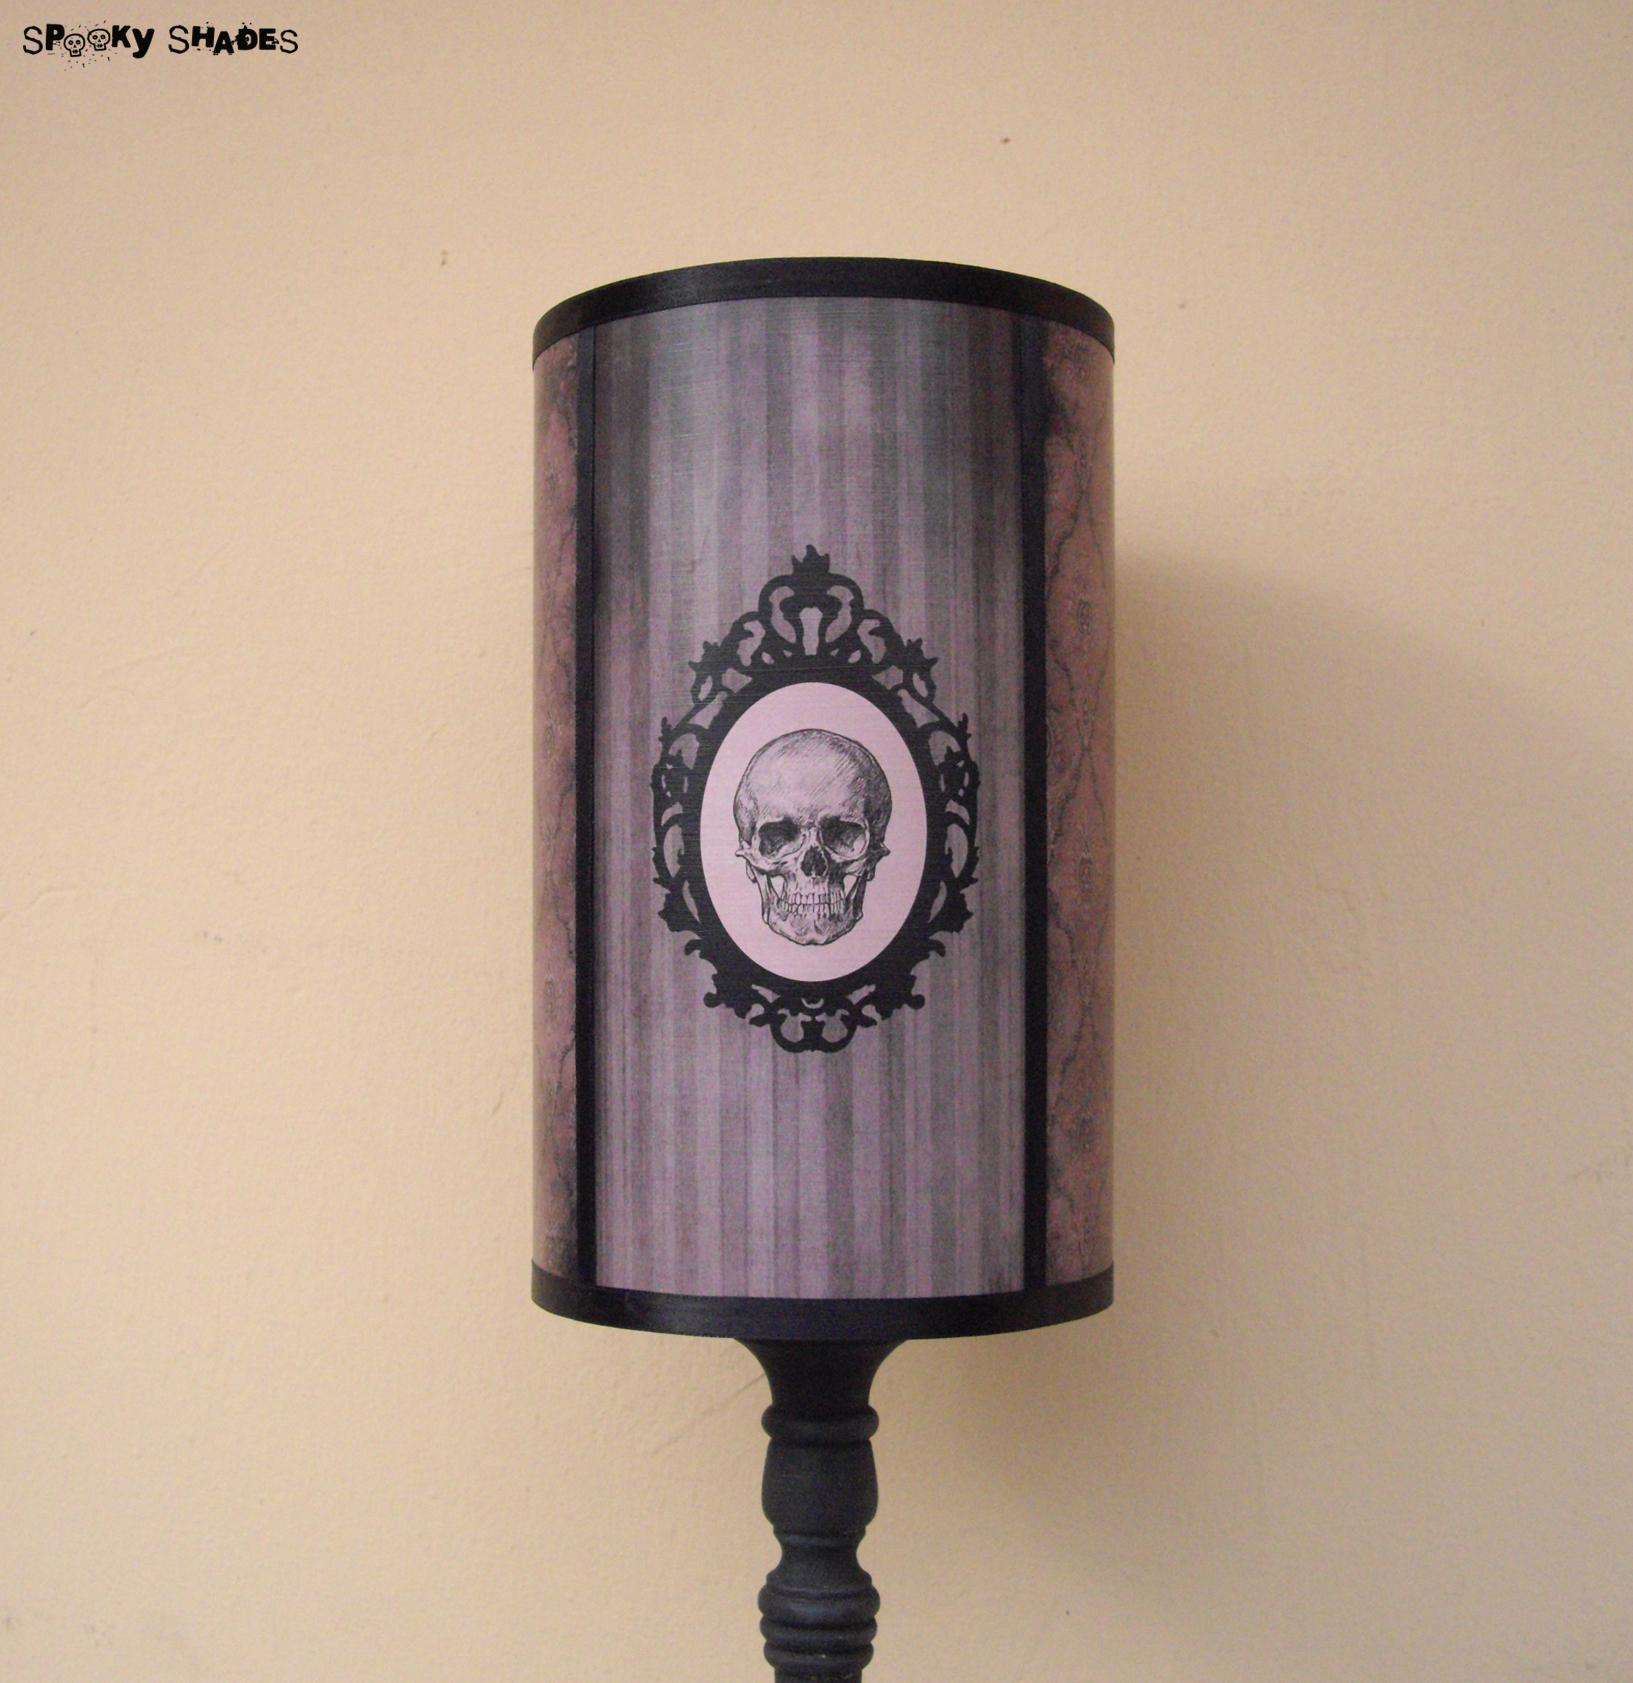 Gothic skull grey striped and damask lamp shade lampshade 153758 rebelsmarketgrungebaroqueskullgreystripedanddamasklampshadelampshadegothiclighting6g aloadofball Image collections